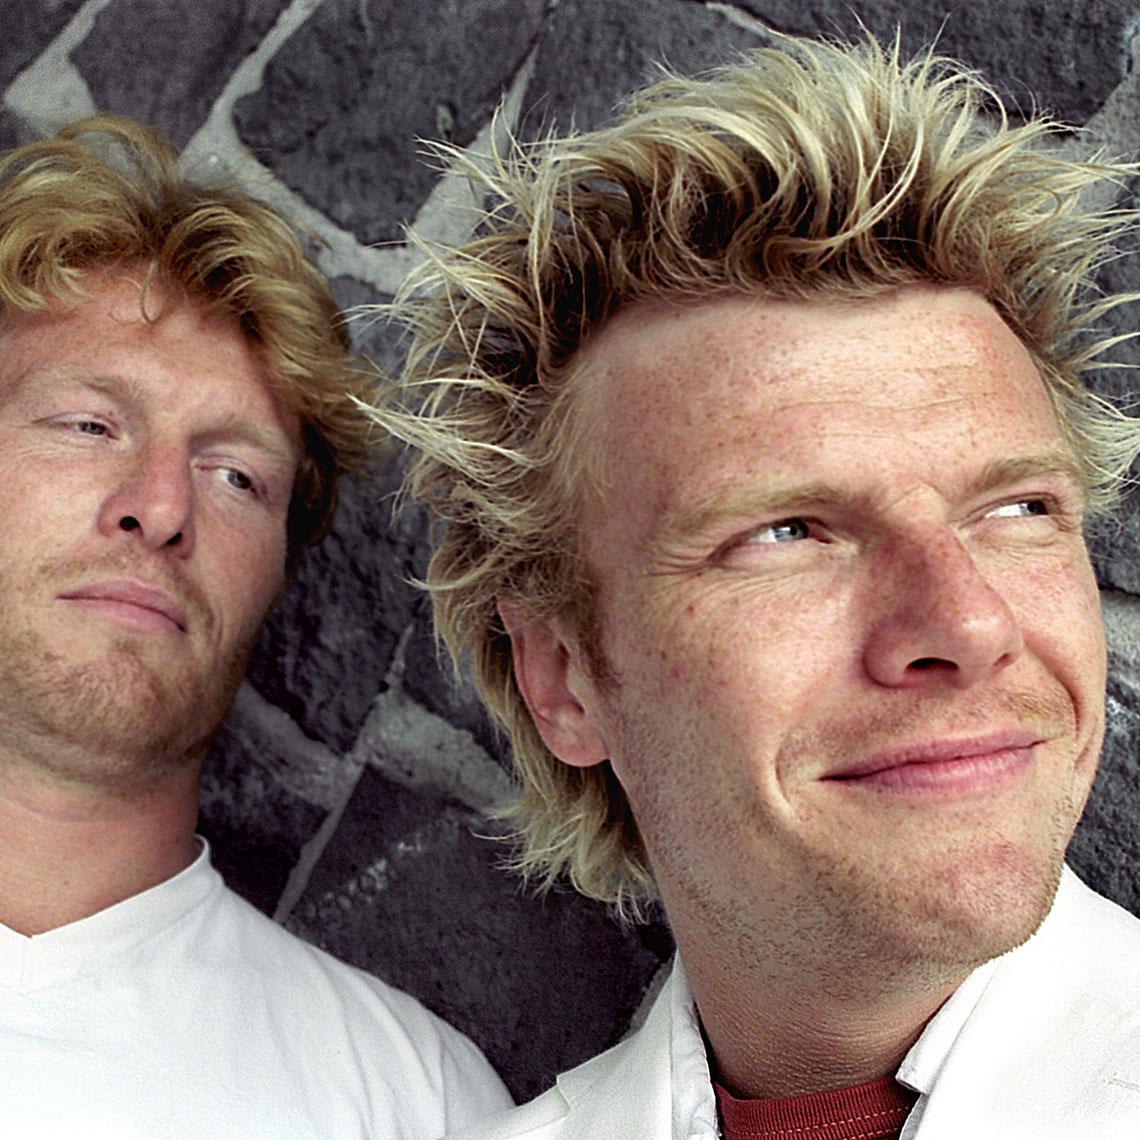 Bastiaan en Roef Ragas | portrait photography | Mike Harris Photography